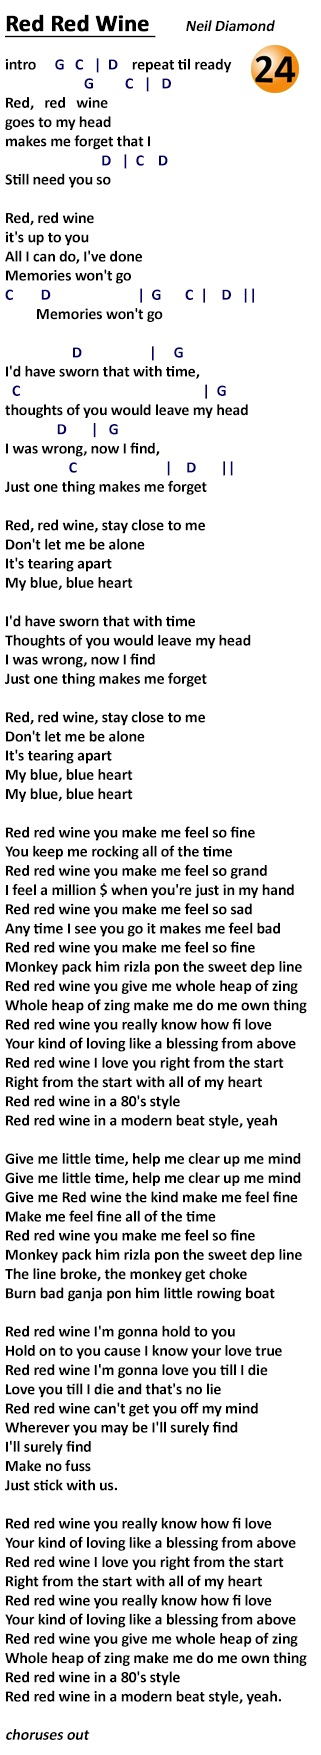 Lyric rainbow connection lyrics : Index of /lyrics/